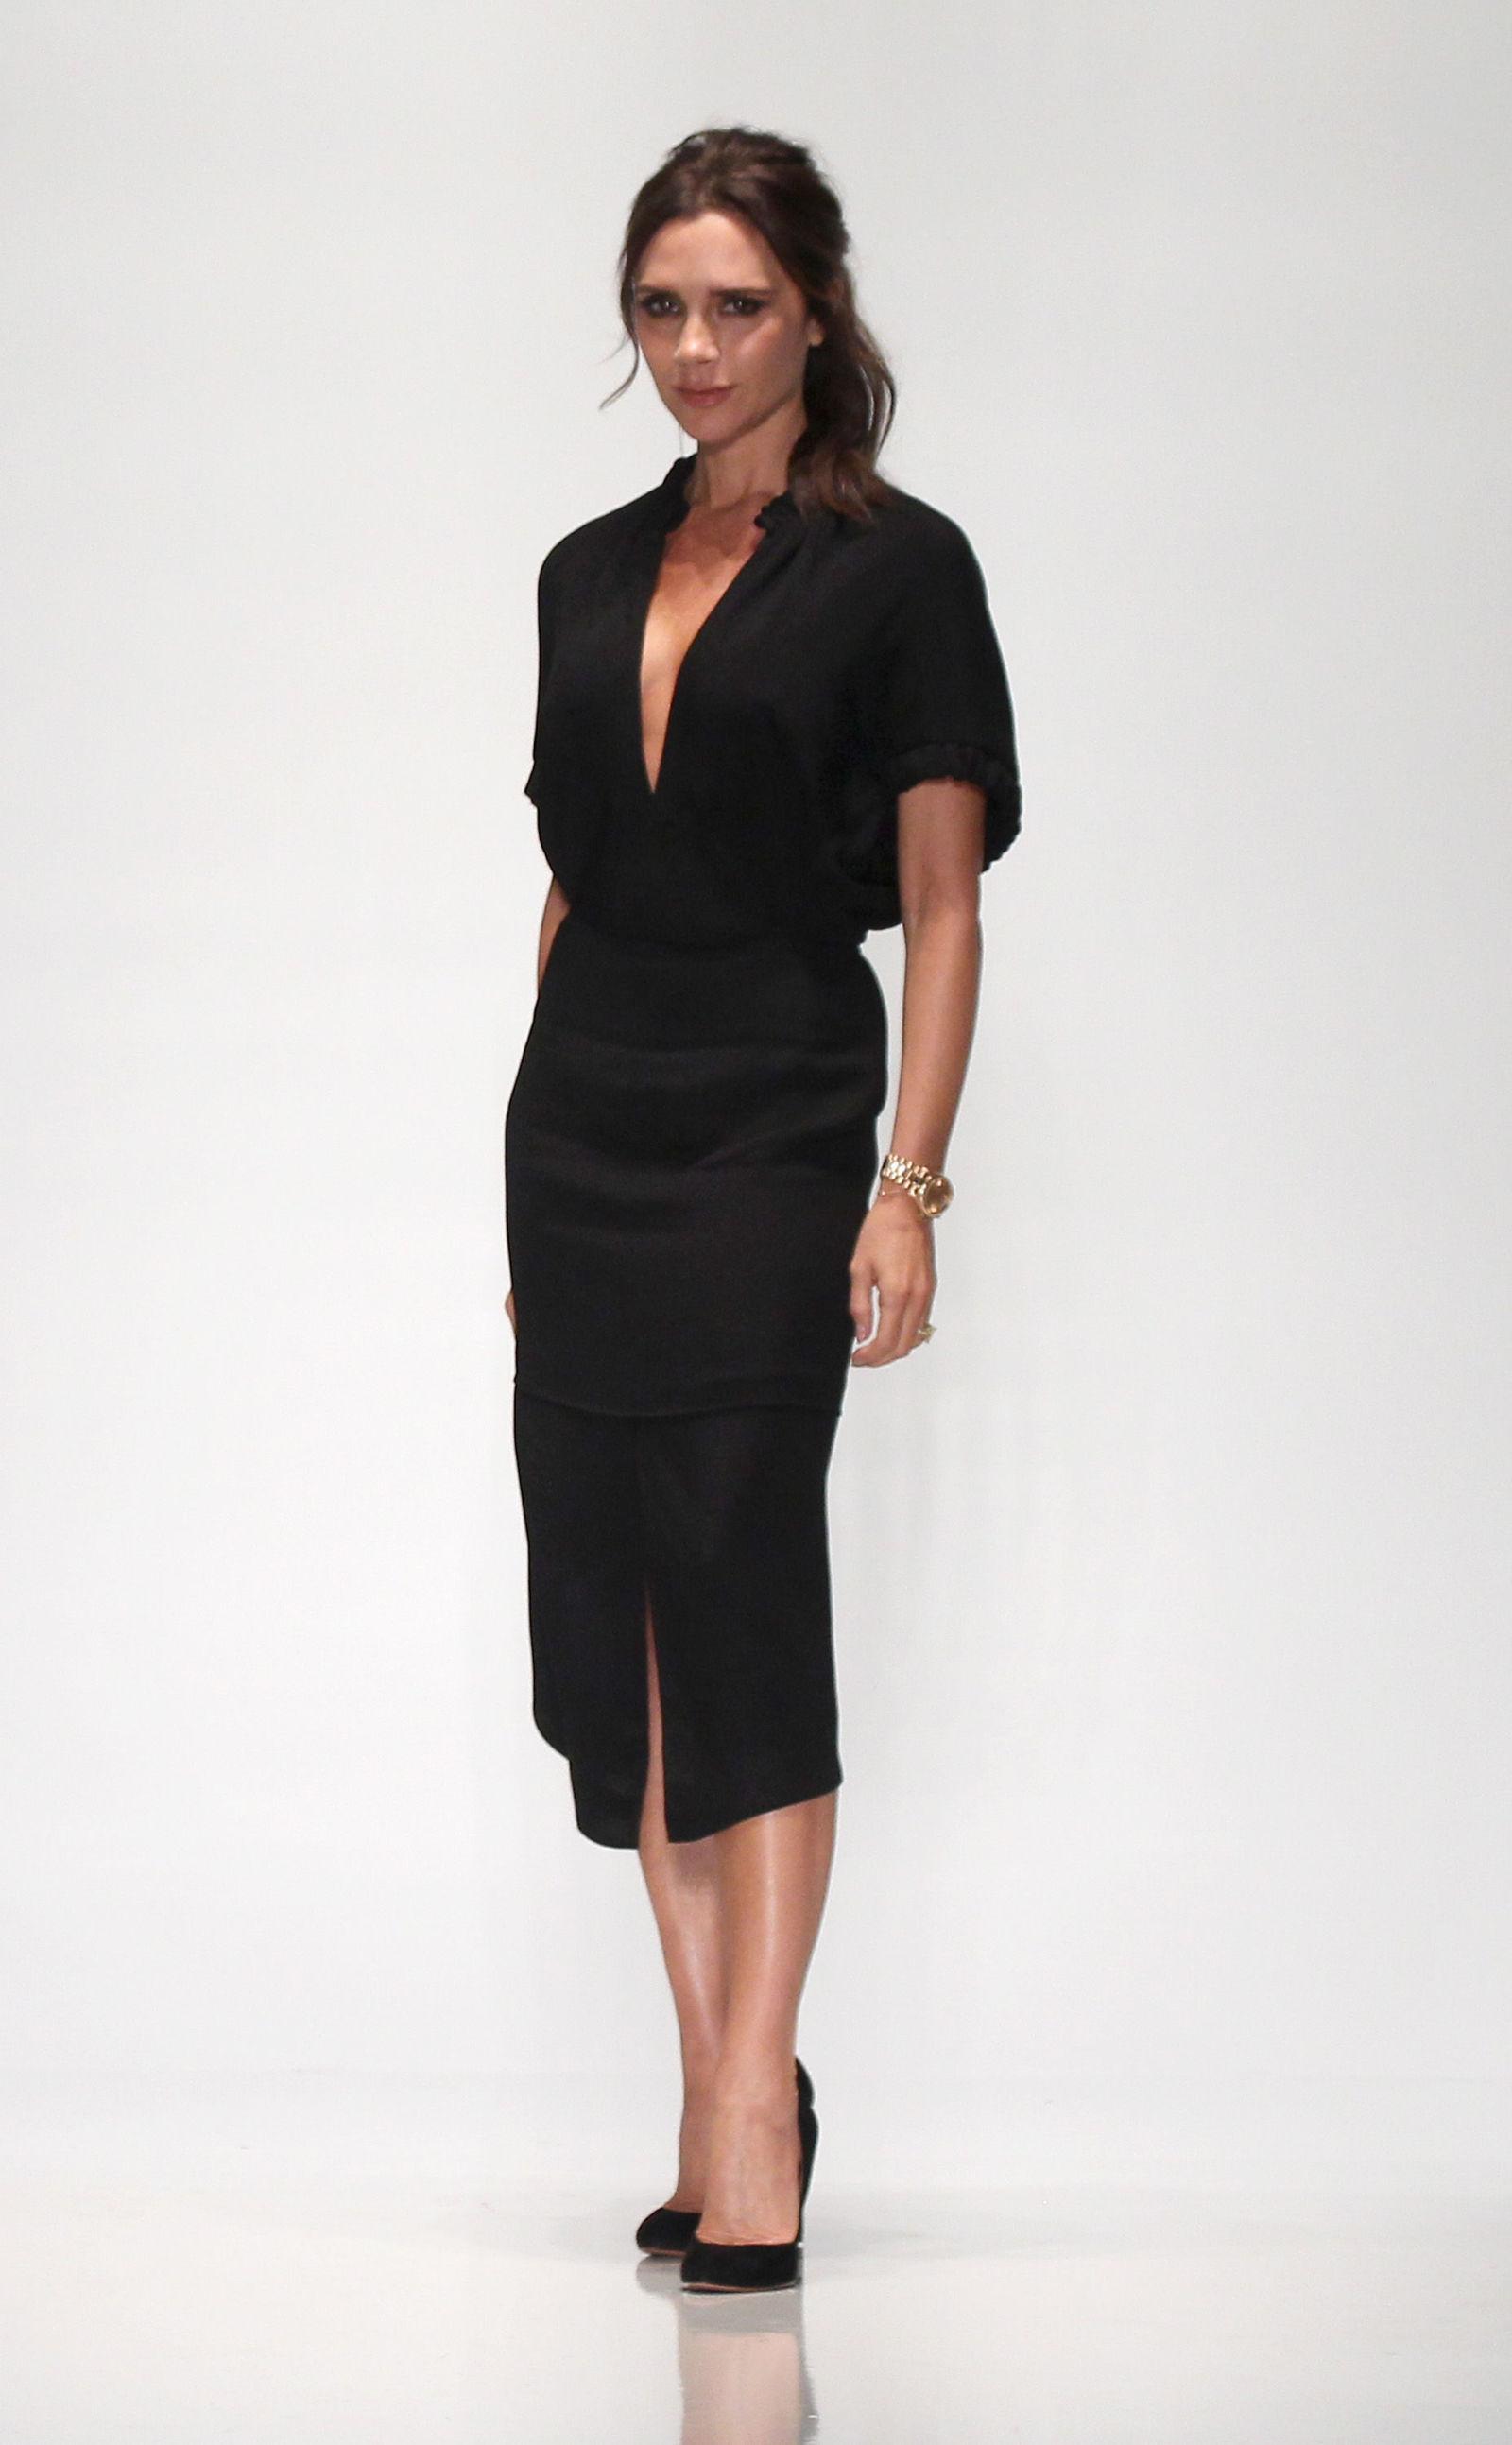 Victoria Beckham has h... Victoria Beckham Clothing